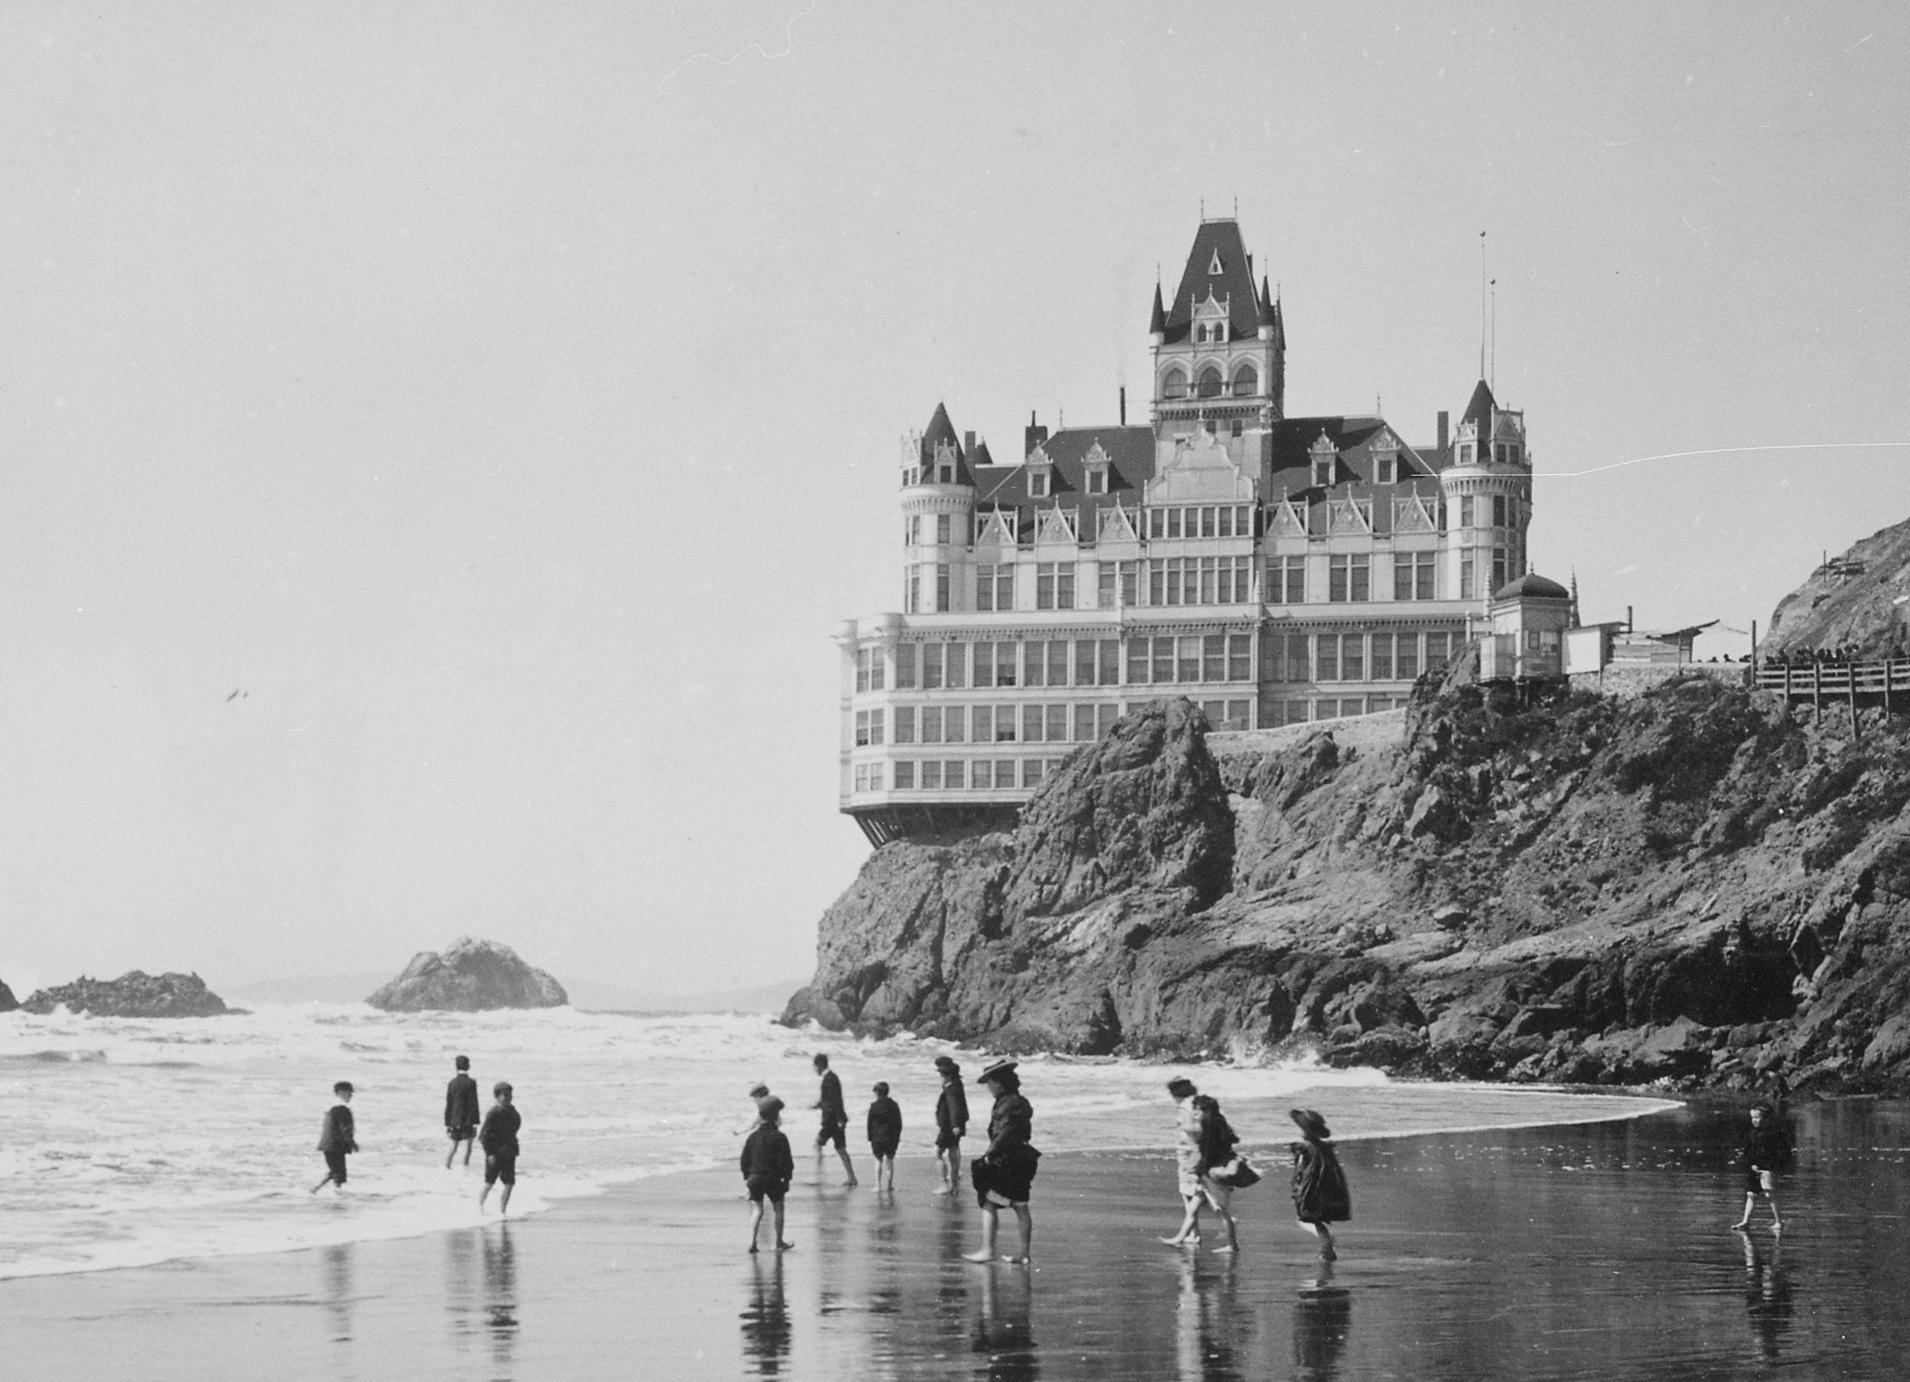 Photo by H.B. Peabody (1902)